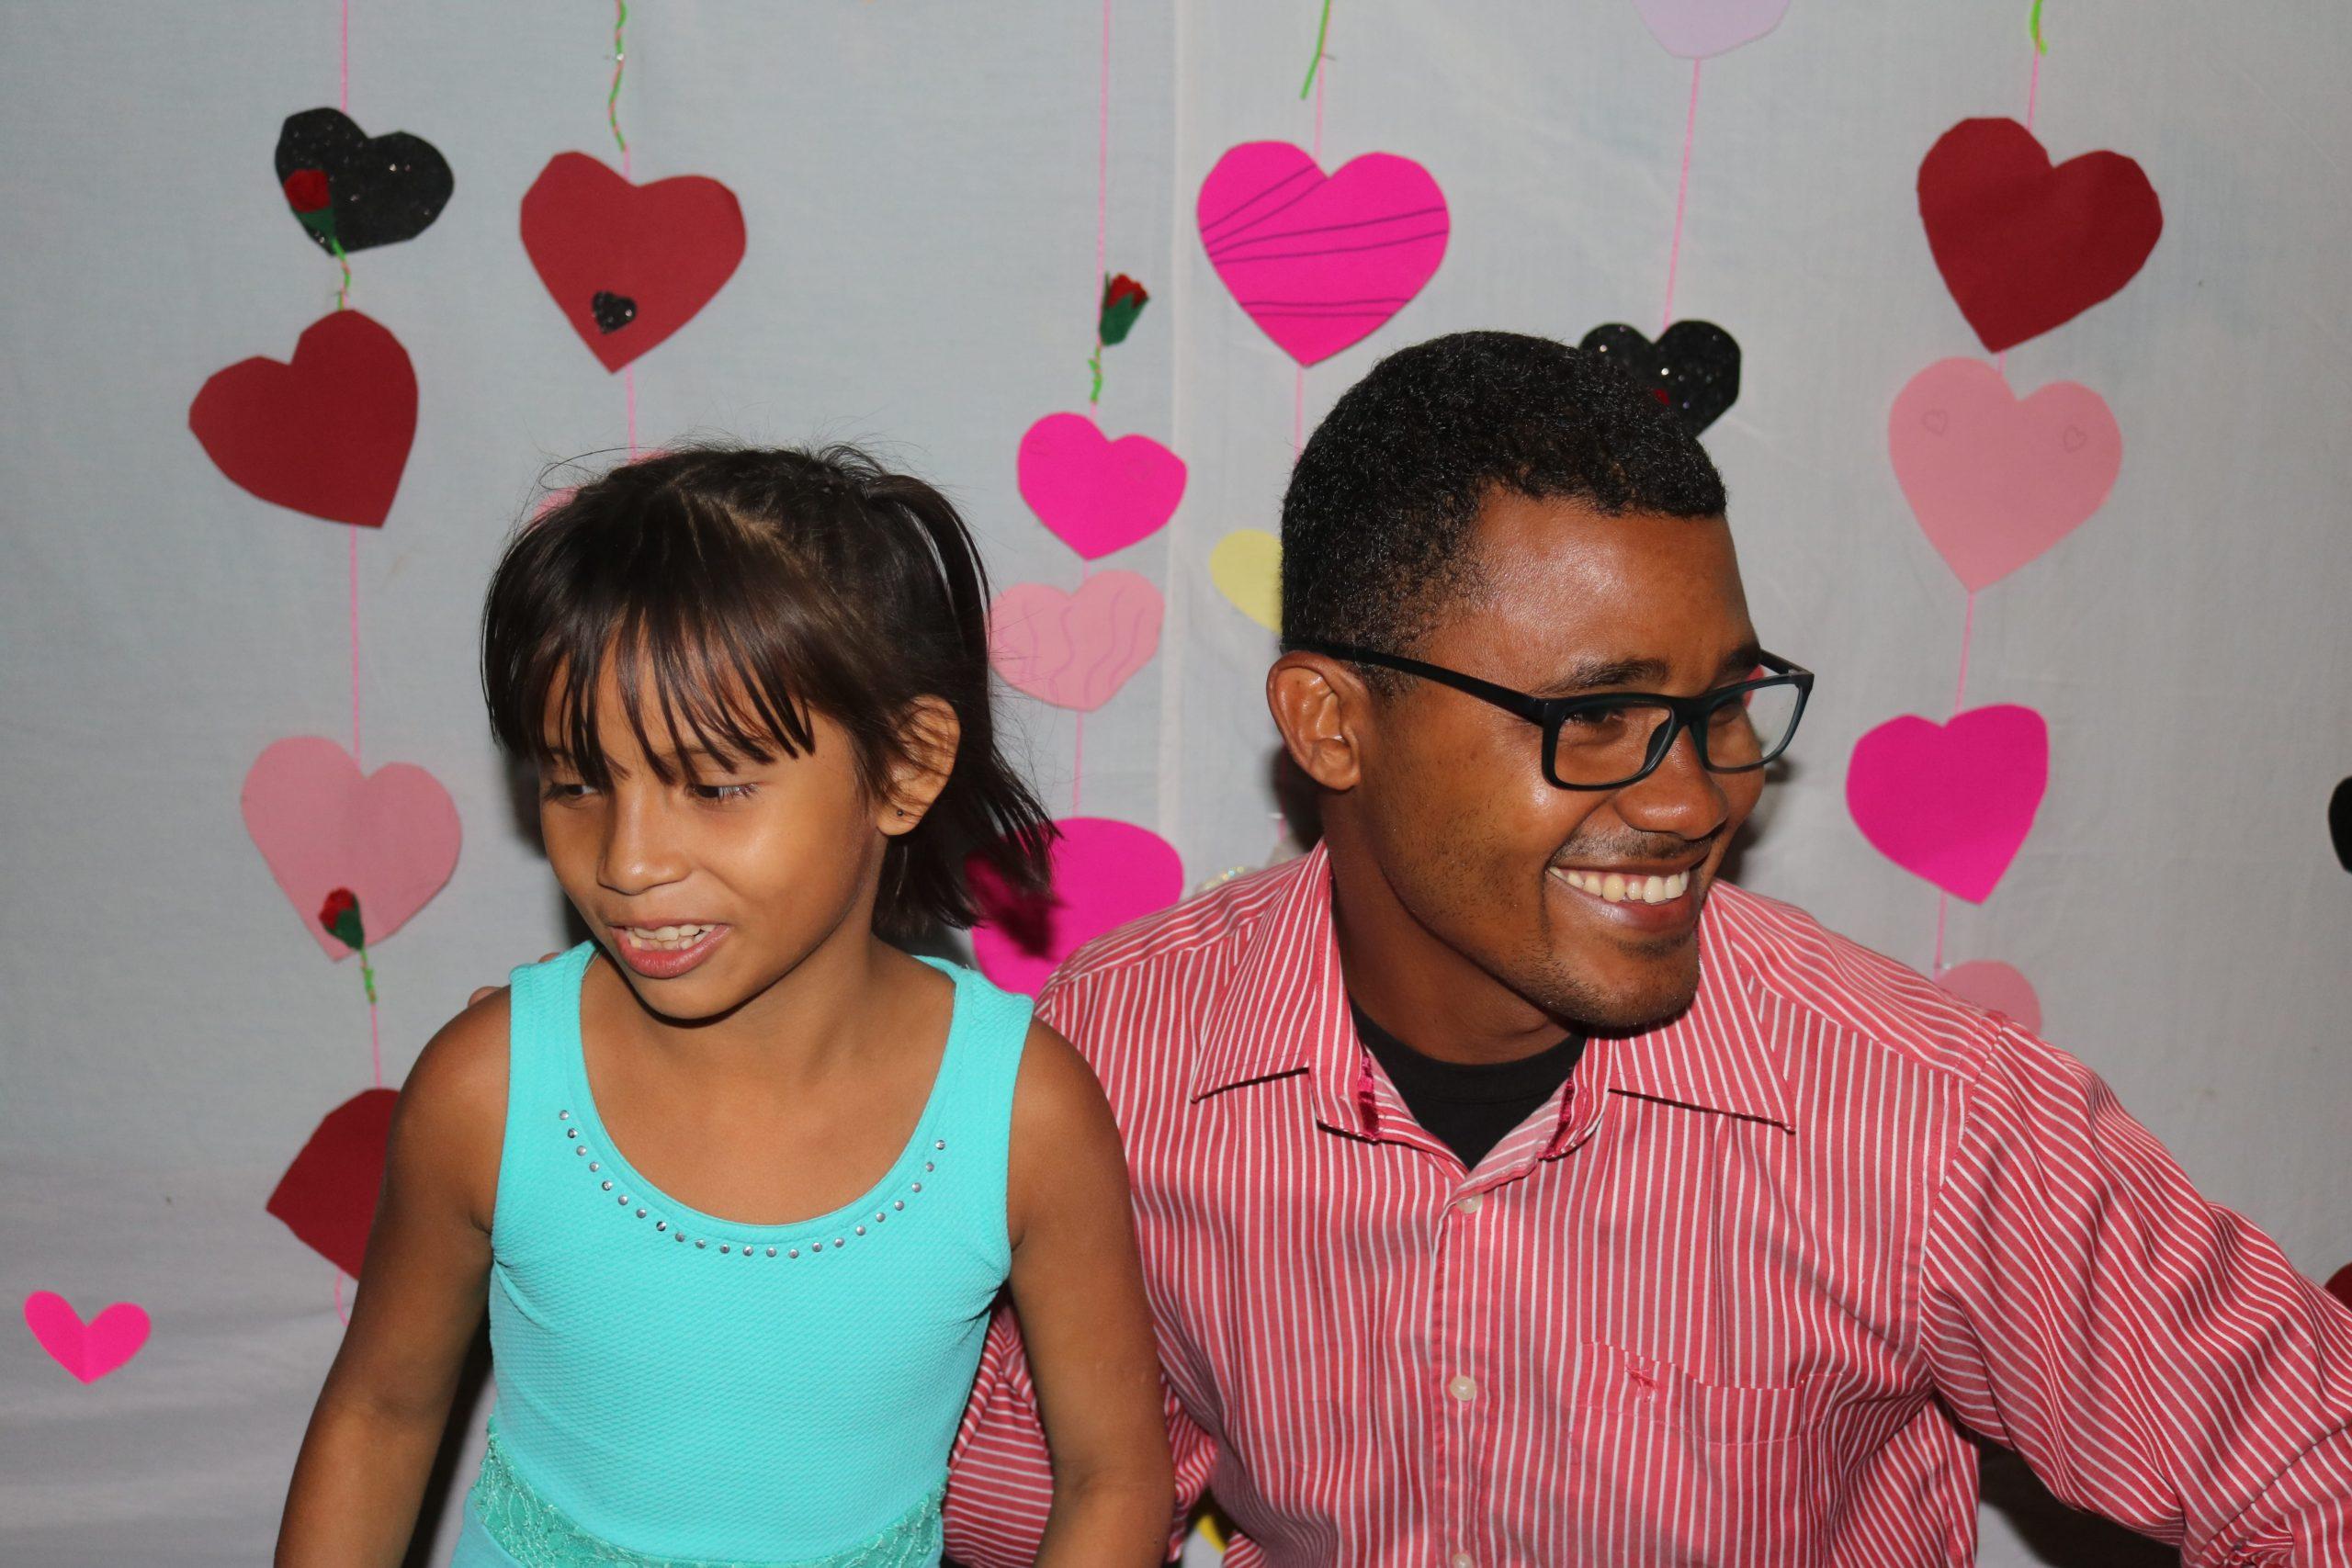 Staff Spotlight: Franqui, Educator and Father